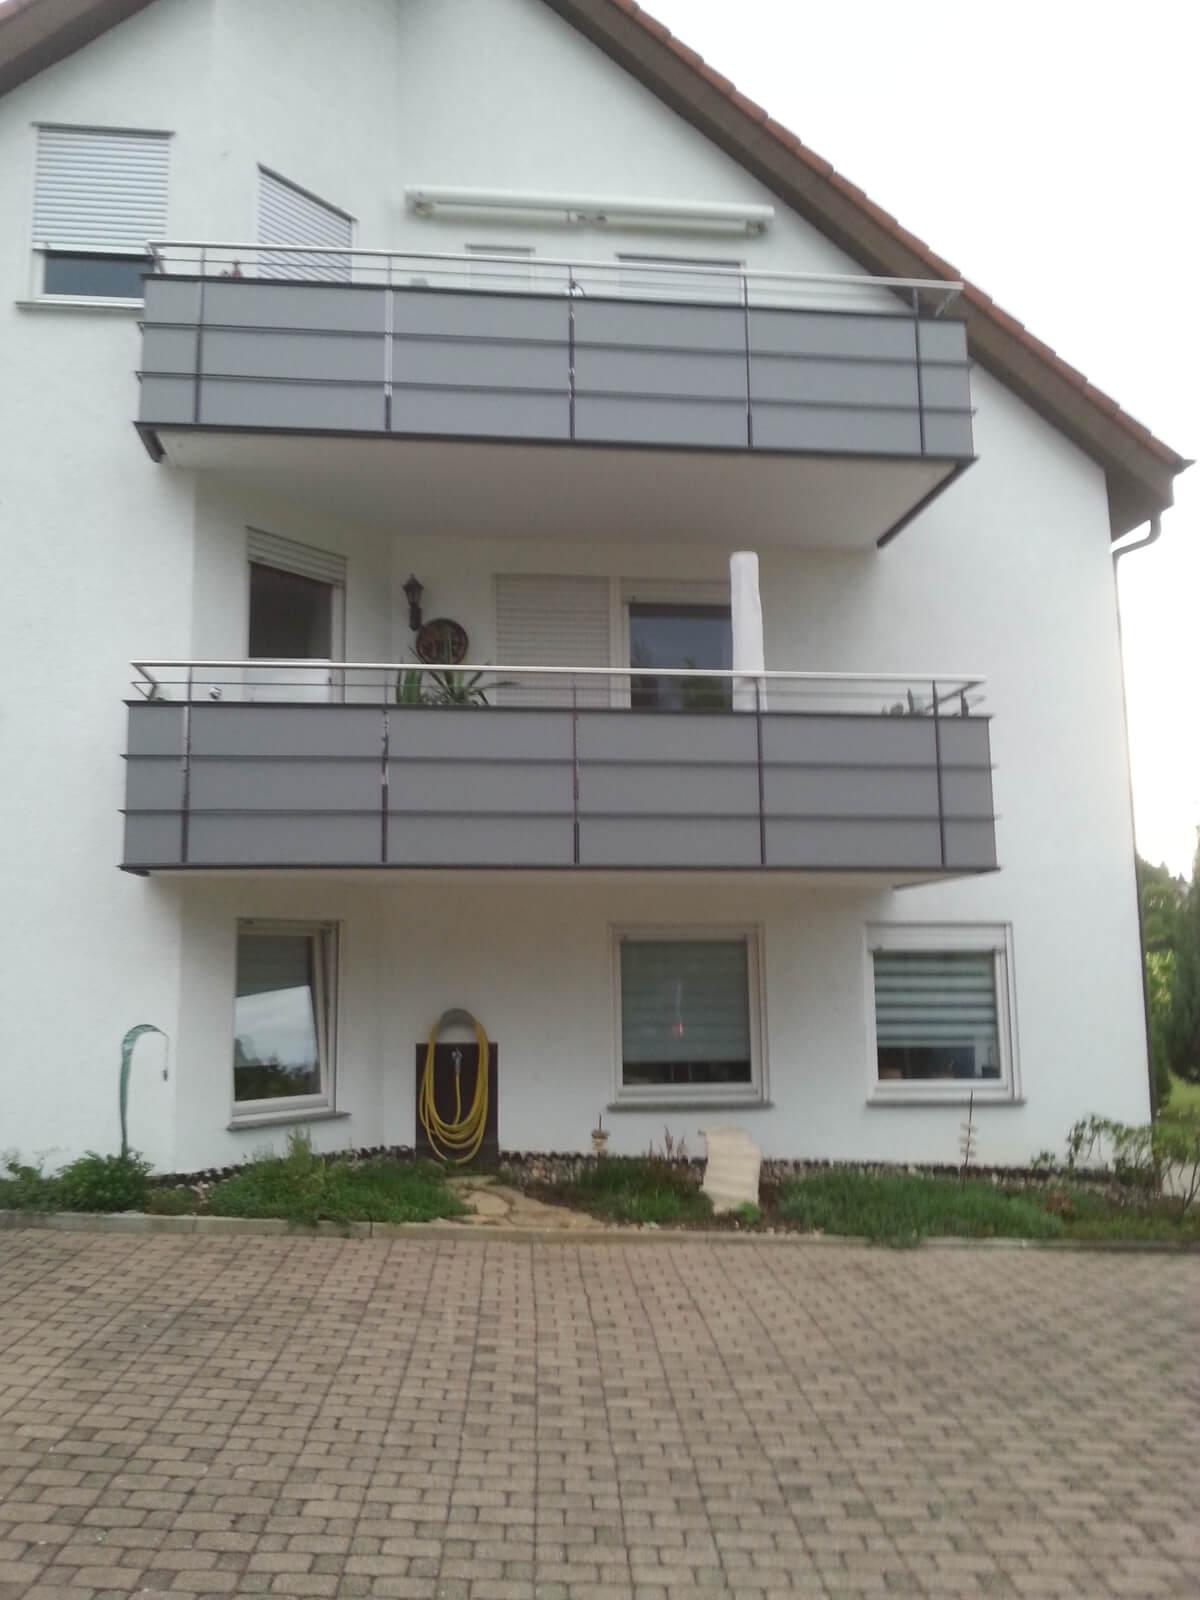 Balkone Schlosserei Hagmeier